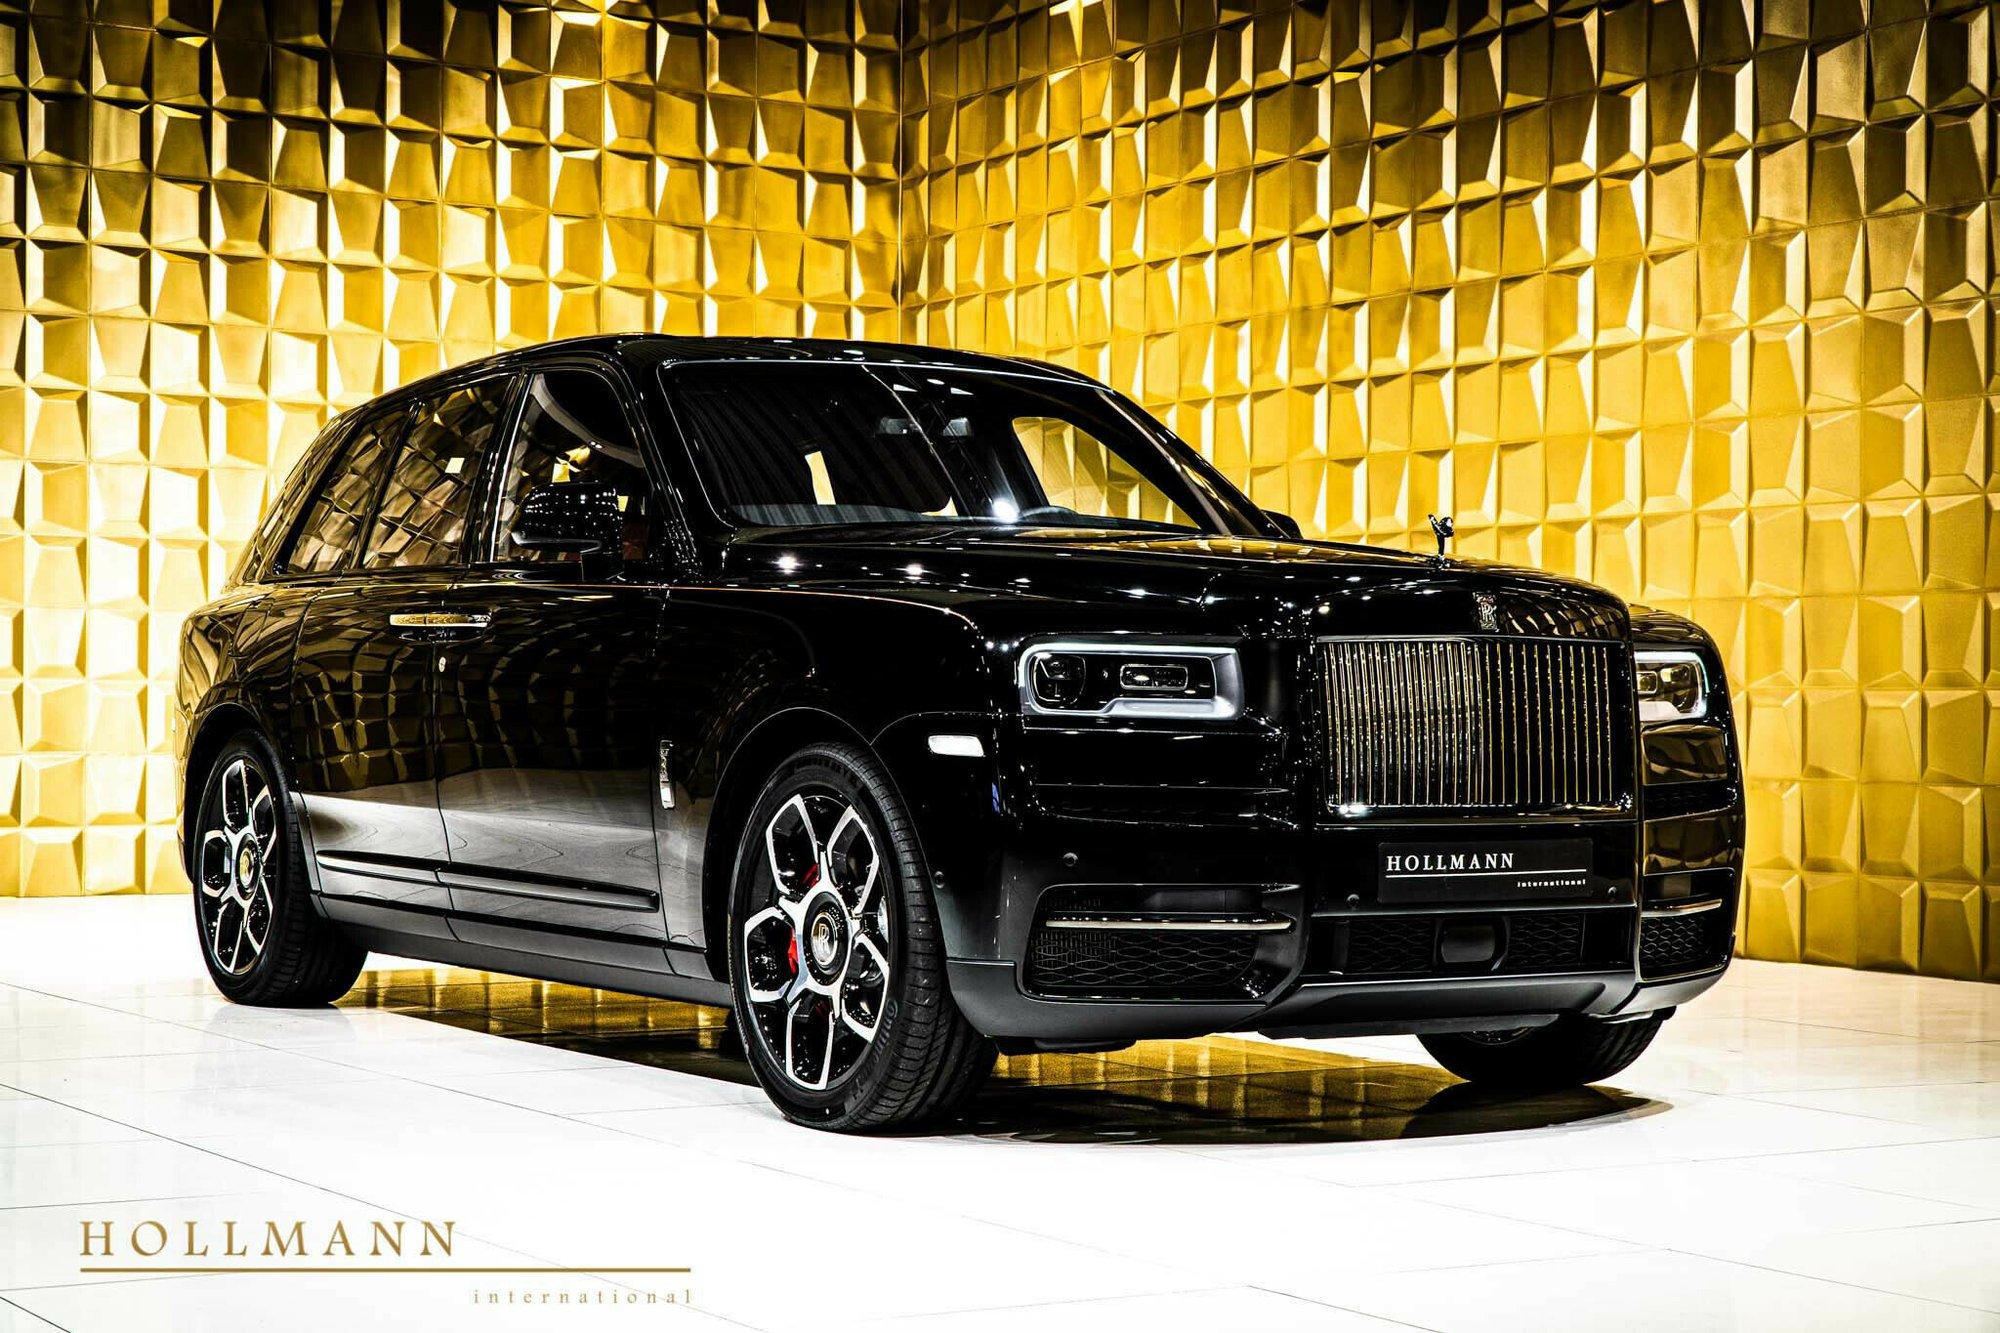 2021 Rolls Royce Cullinan In Stuhr Germany For Sale 11251543